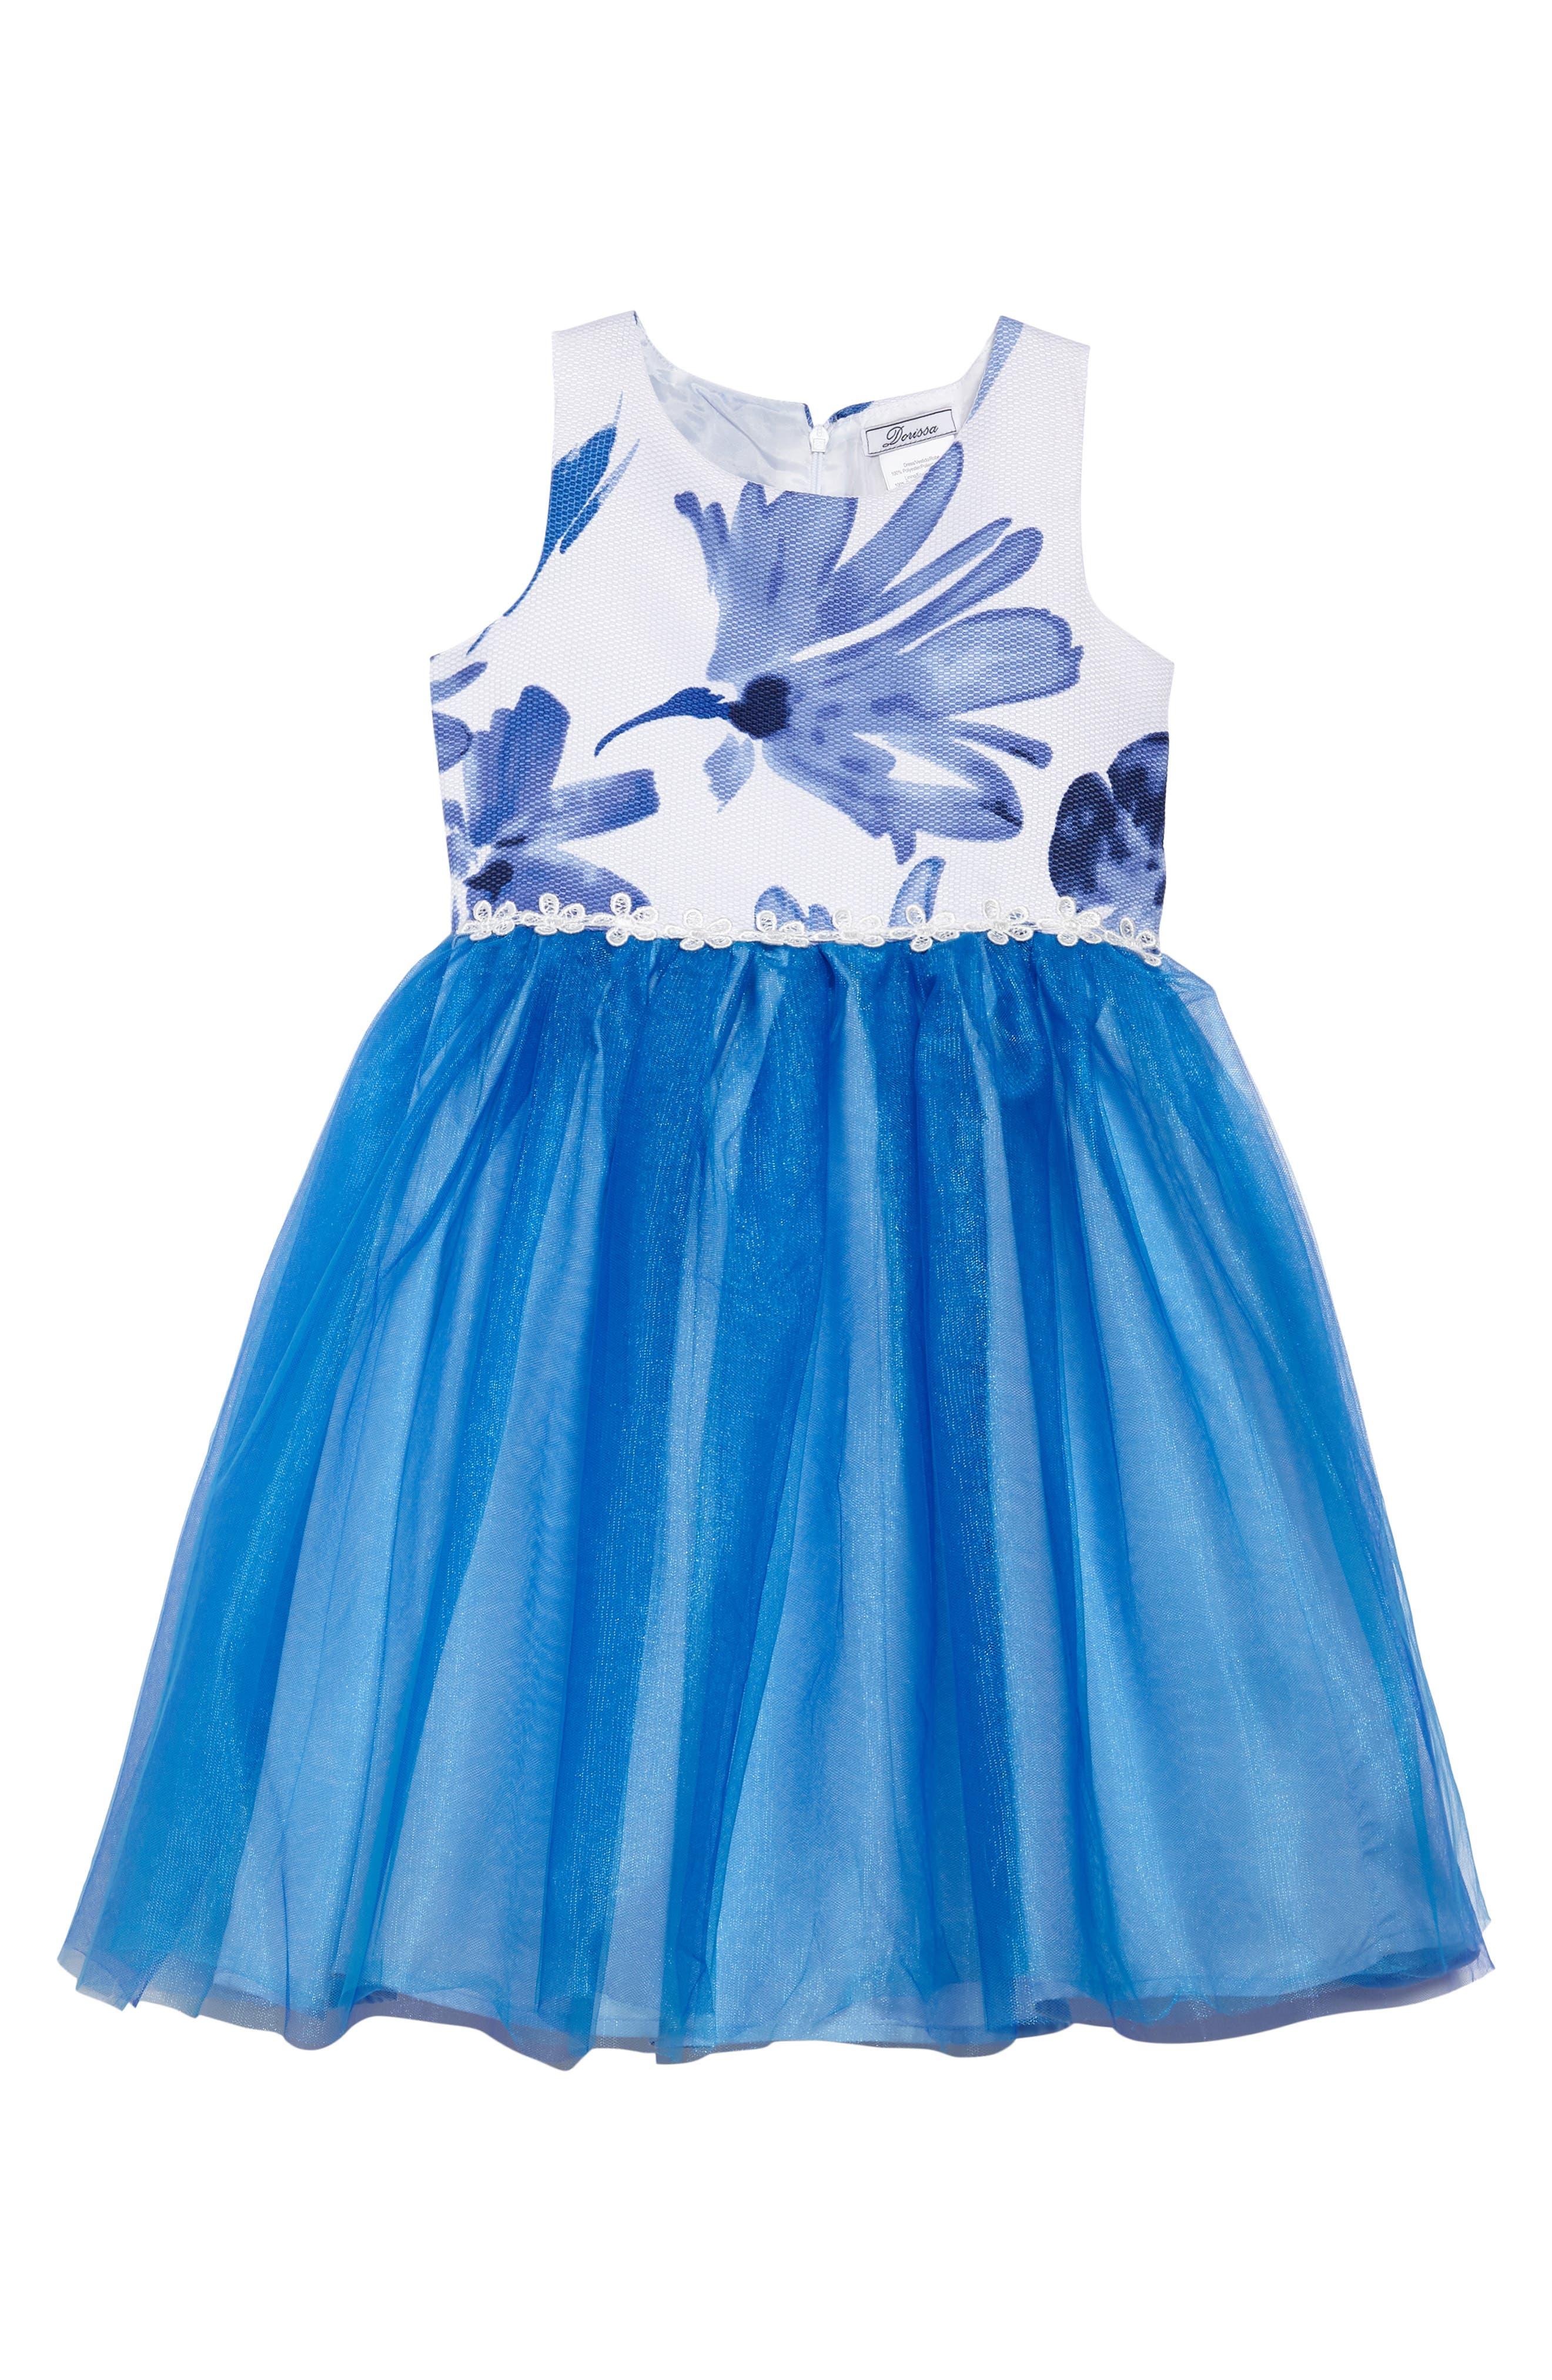 Kathy Sleeveless Dress,                         Main,                         color, Blue/ White